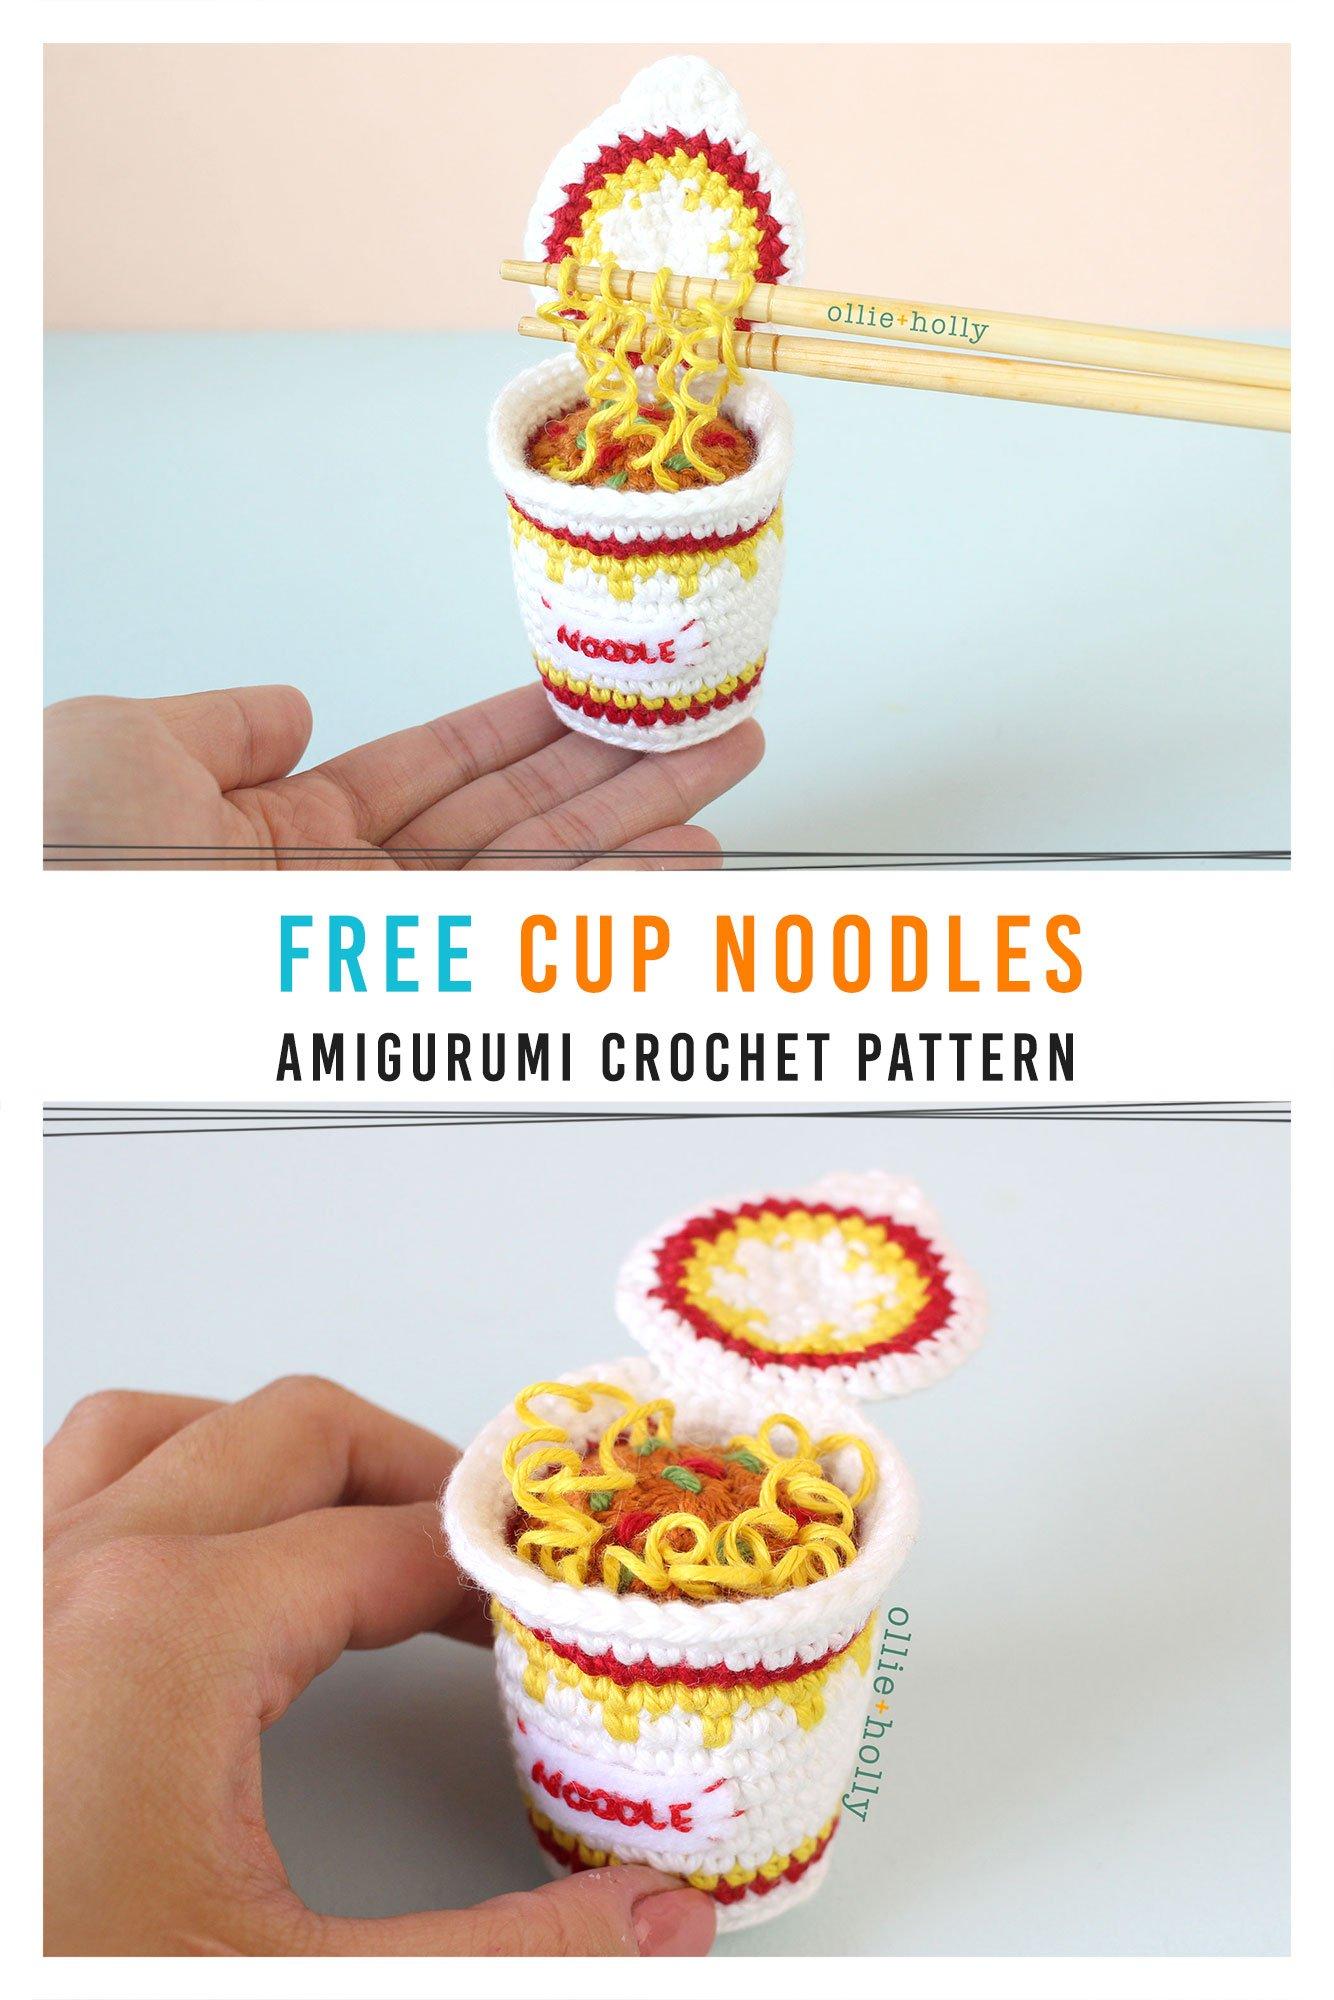 Free Cup Ramen Noodles Instant Ramen Amigurumi Toy Crochet Pattern Pinterest